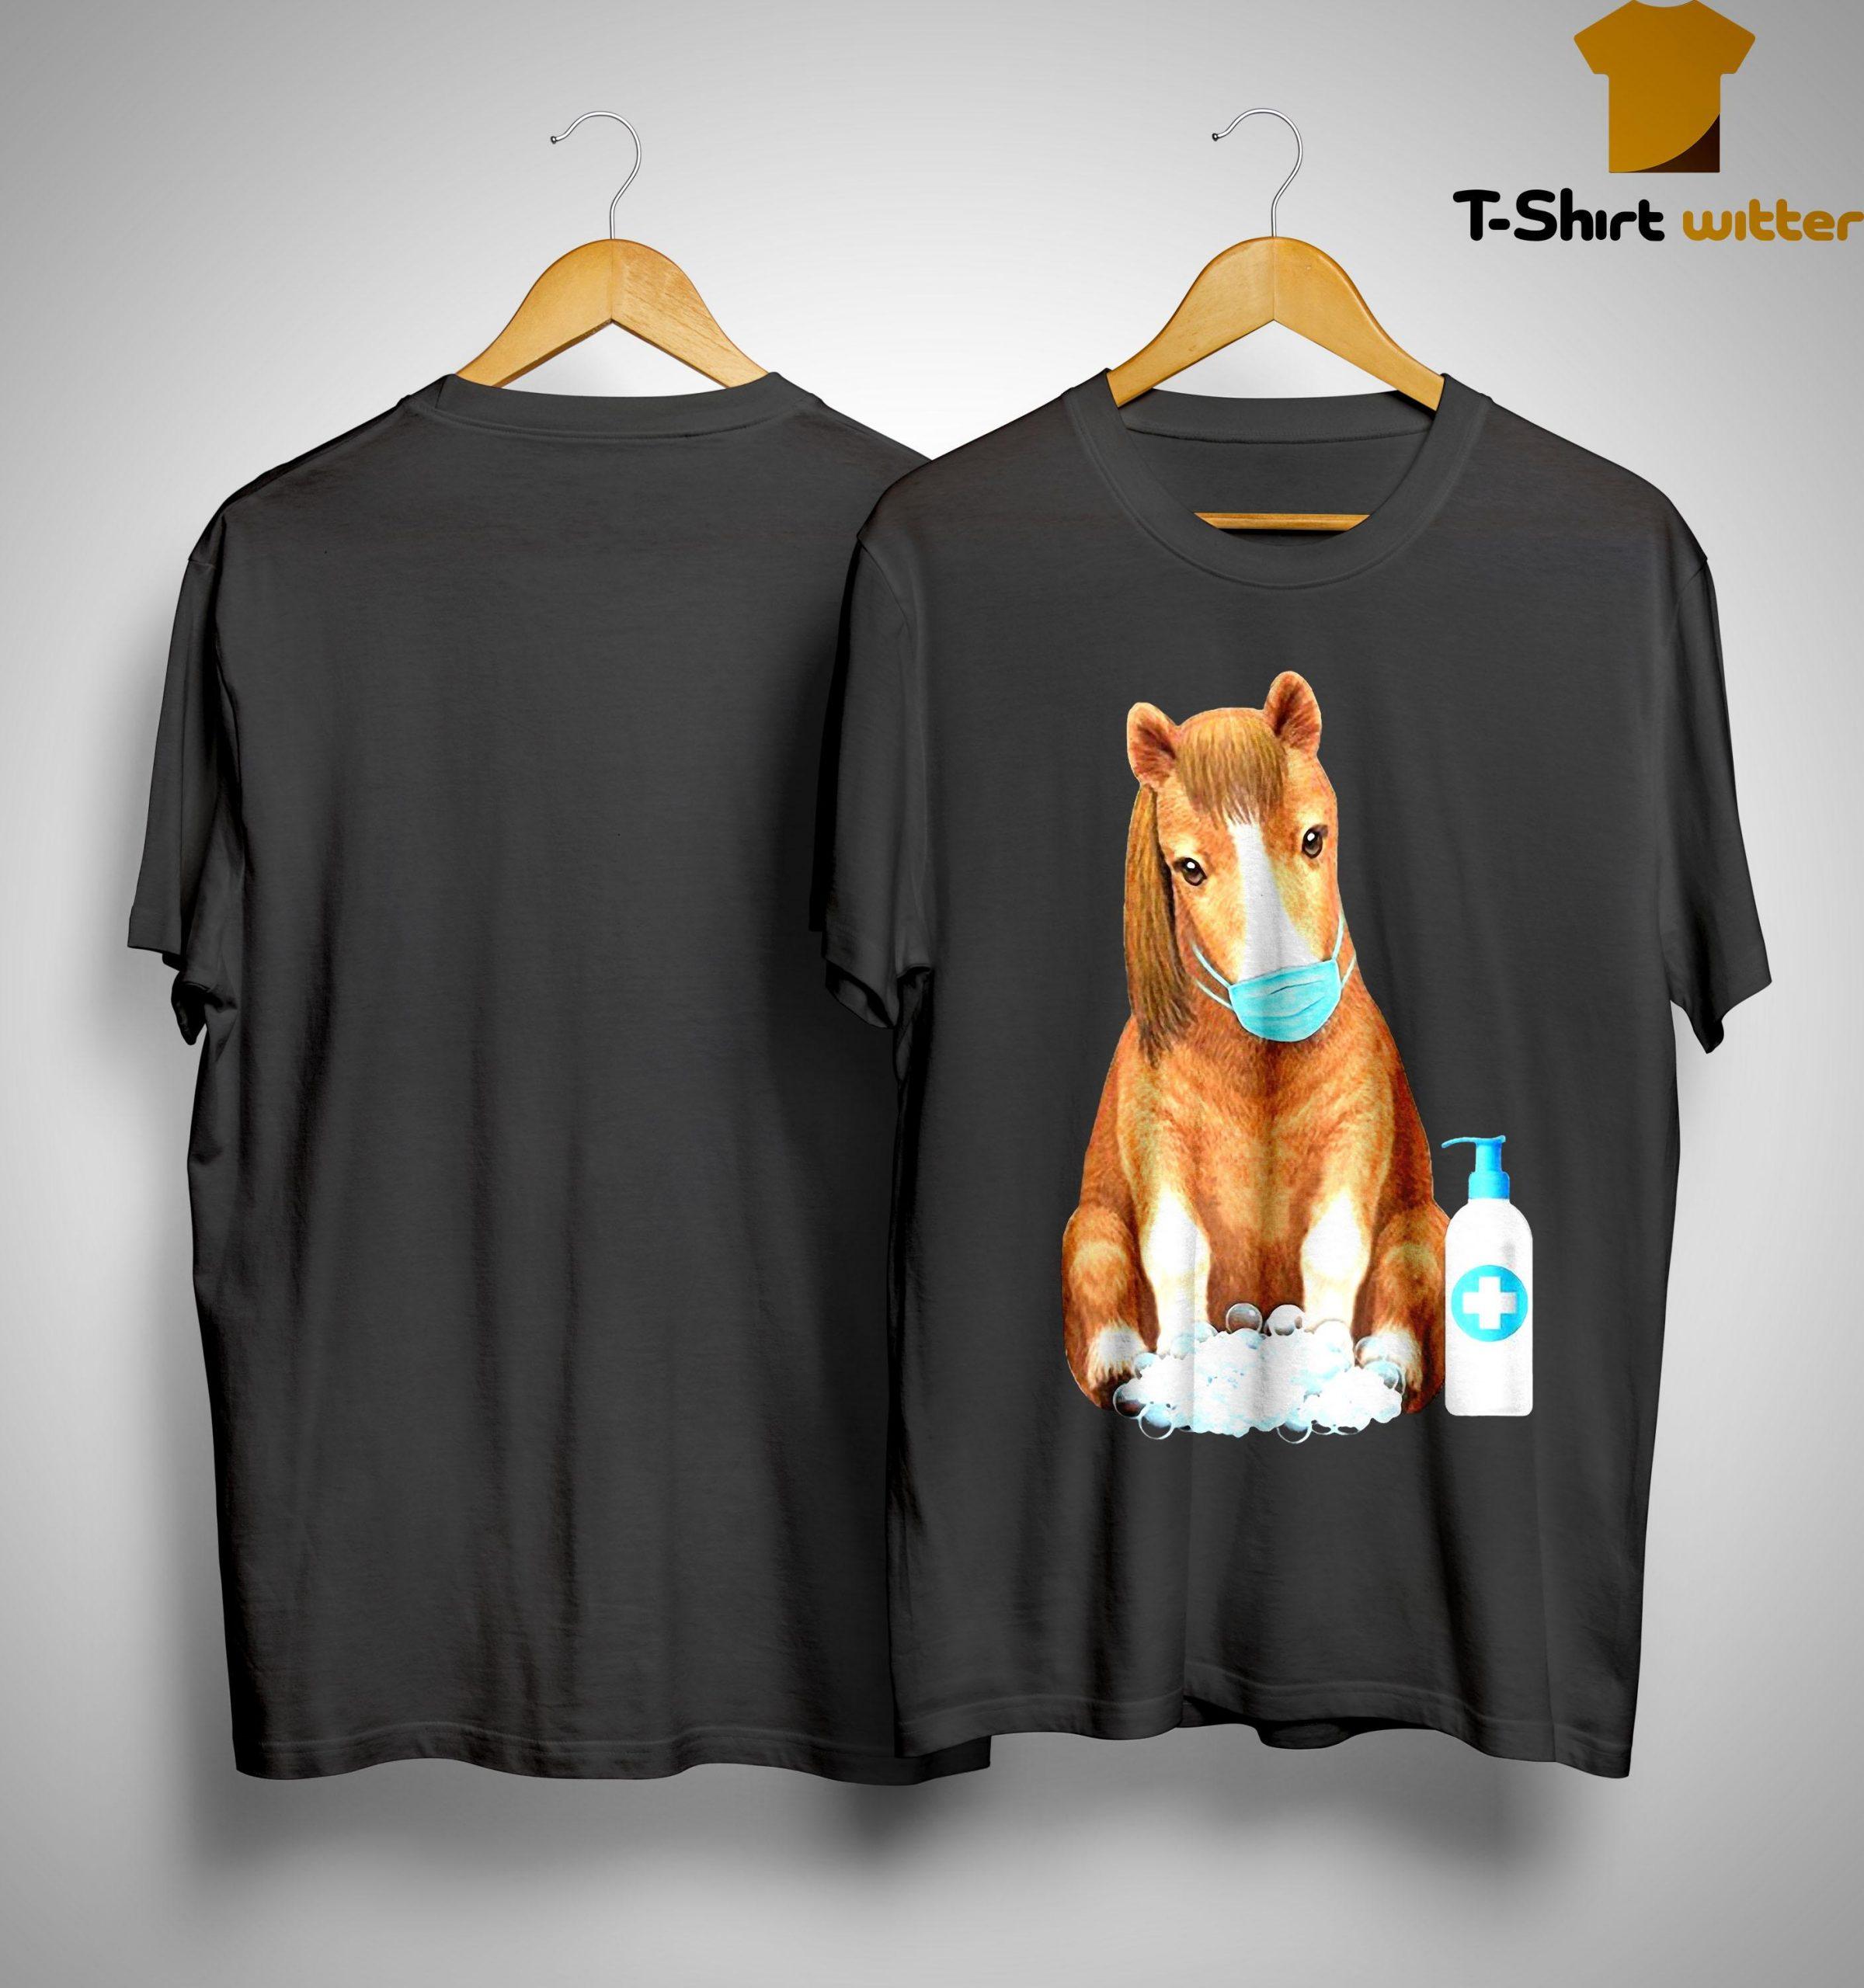 Horse Face Mask Washing Hand Shirt